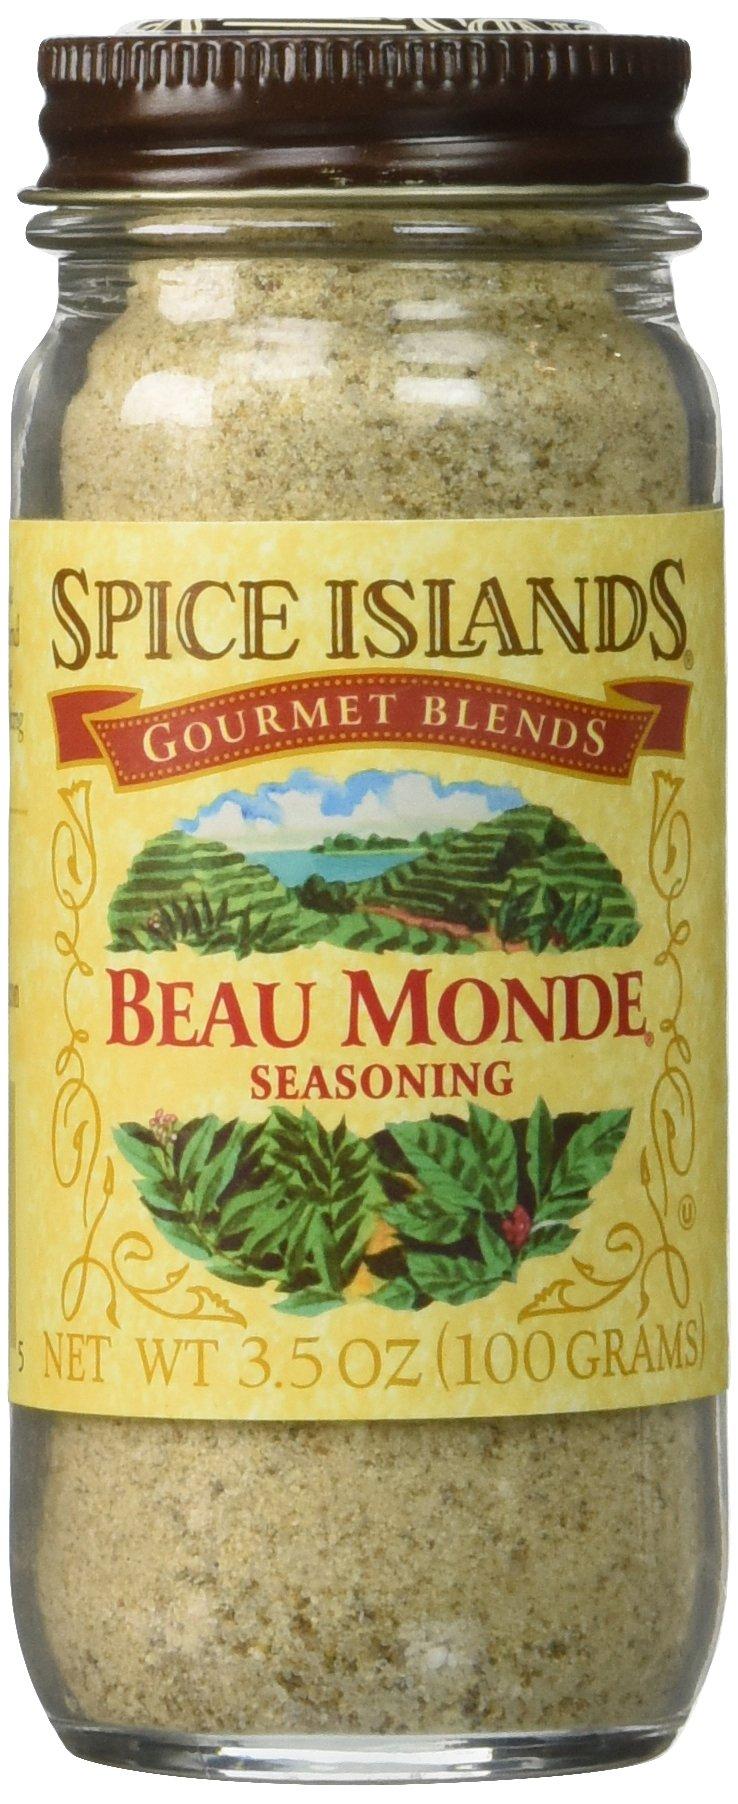 Spice Island Beau Monde Seasoning, 3.5 oz, 2 pk